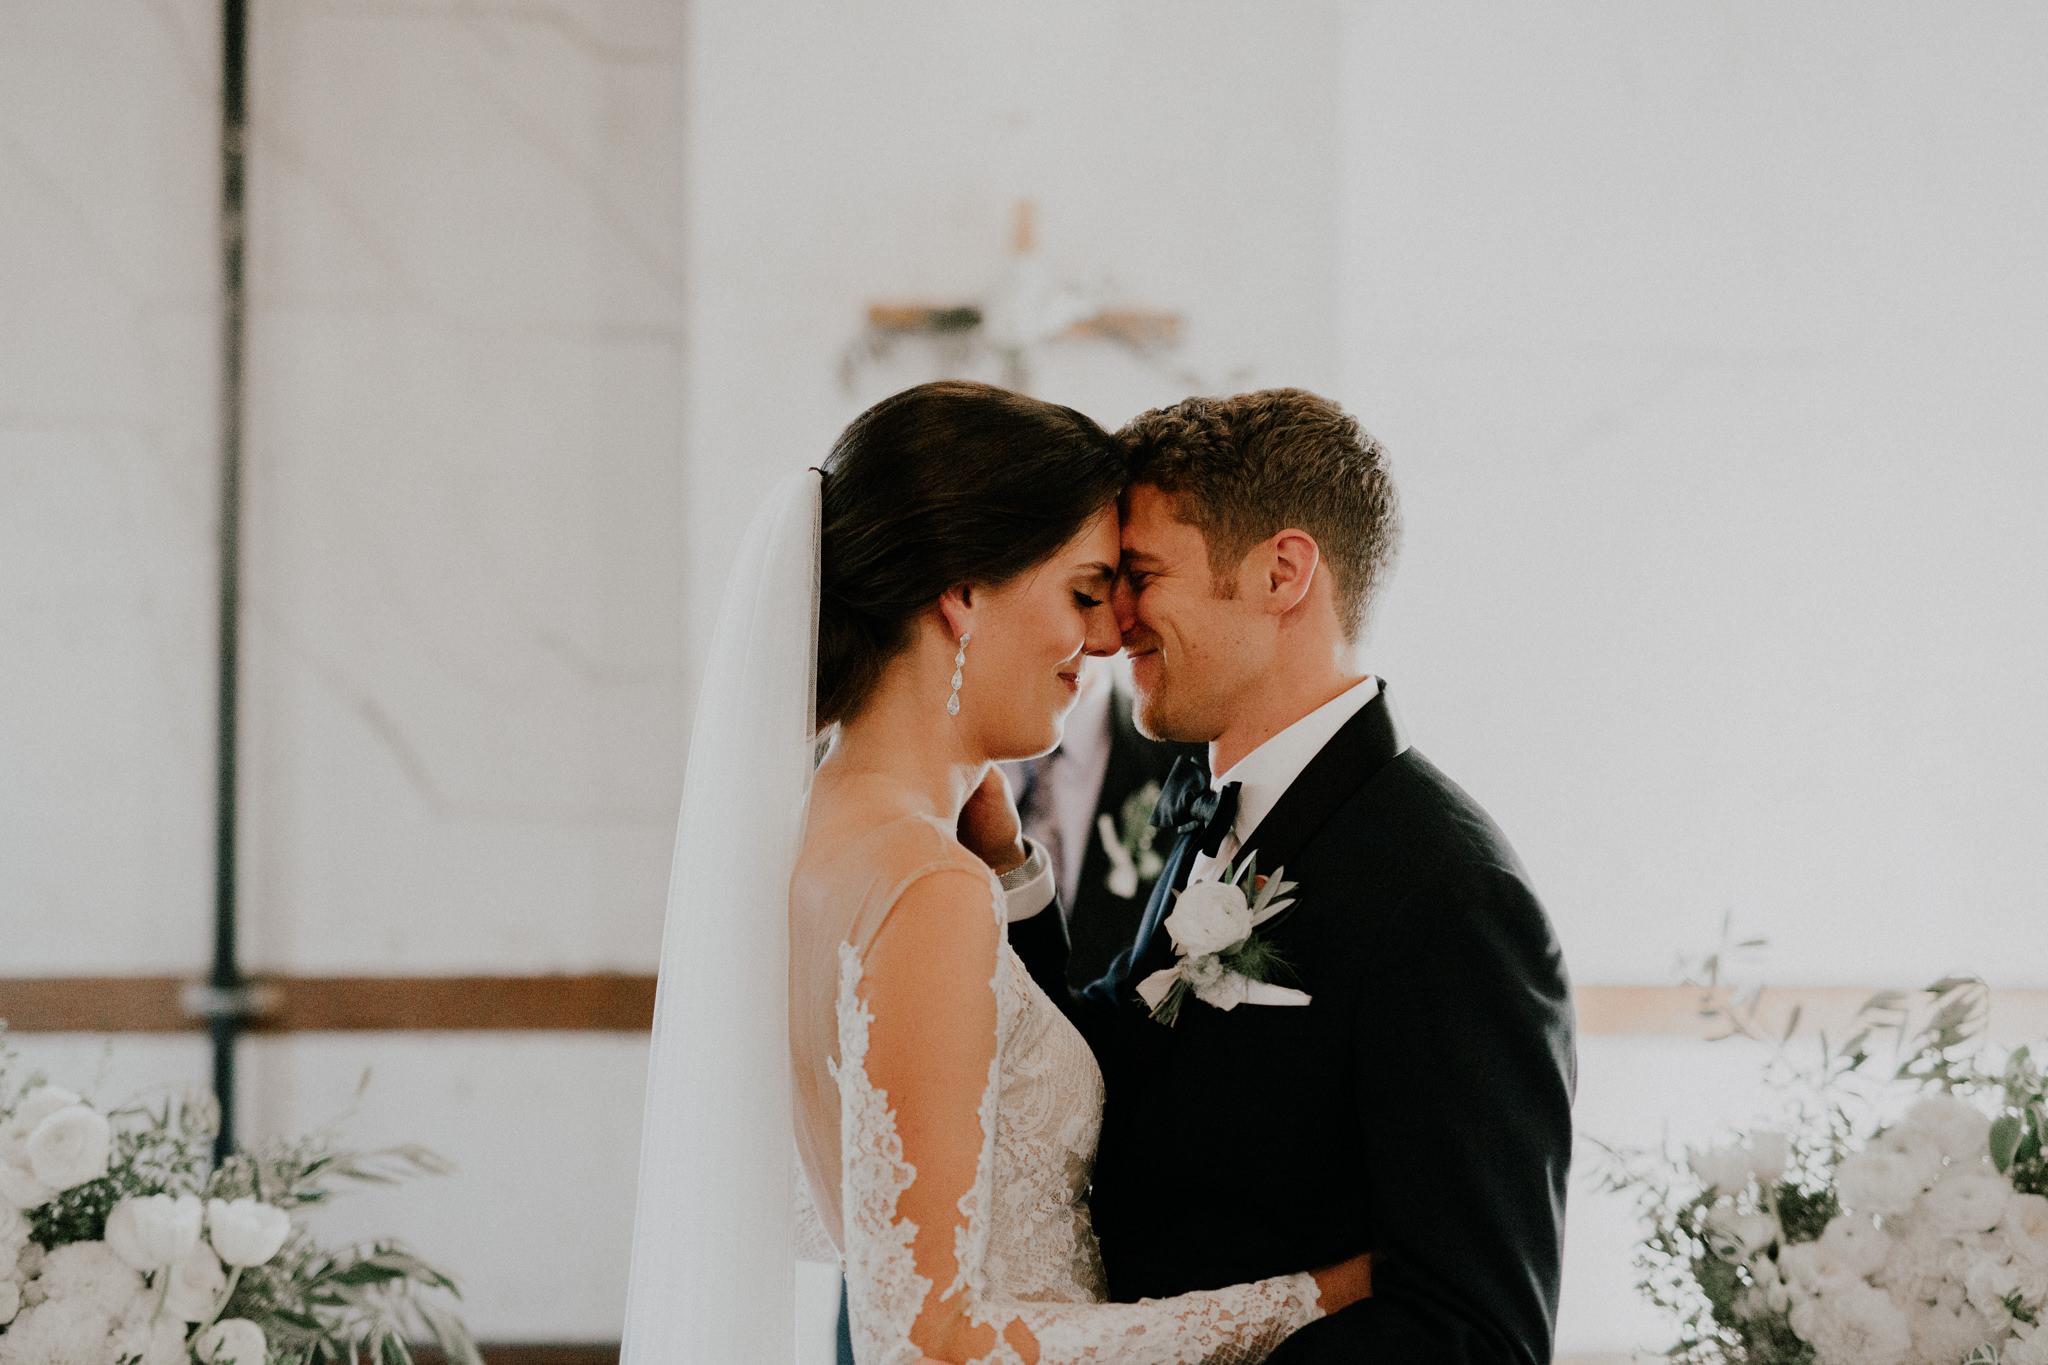 wedding-headlands-center-for-the-arts-sausalito-84.jpg